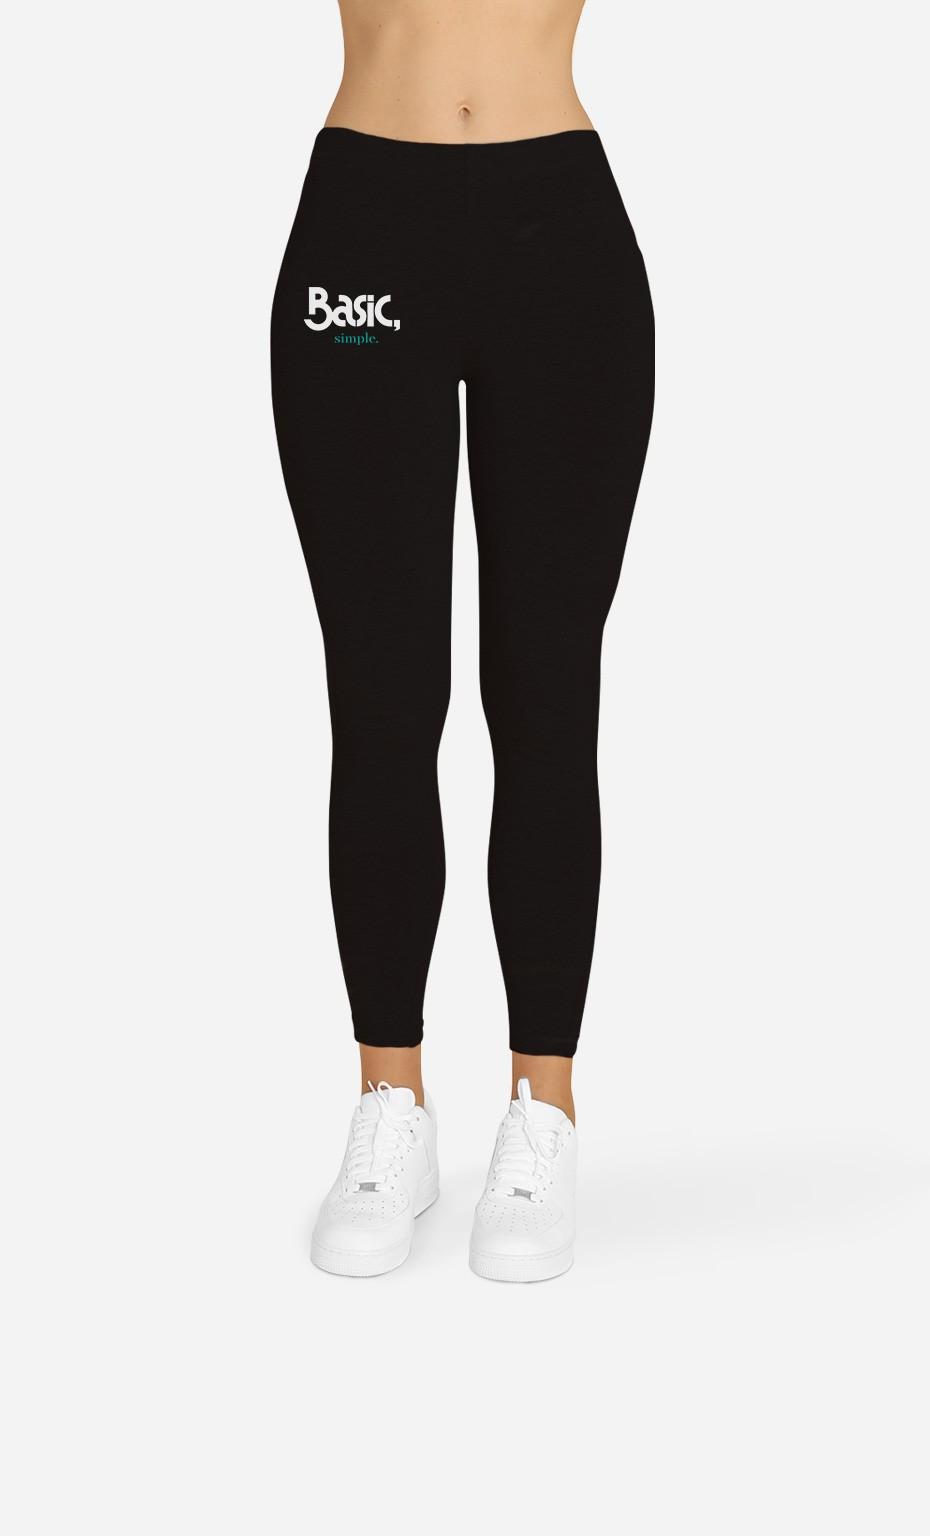 Legging Basic & Simple